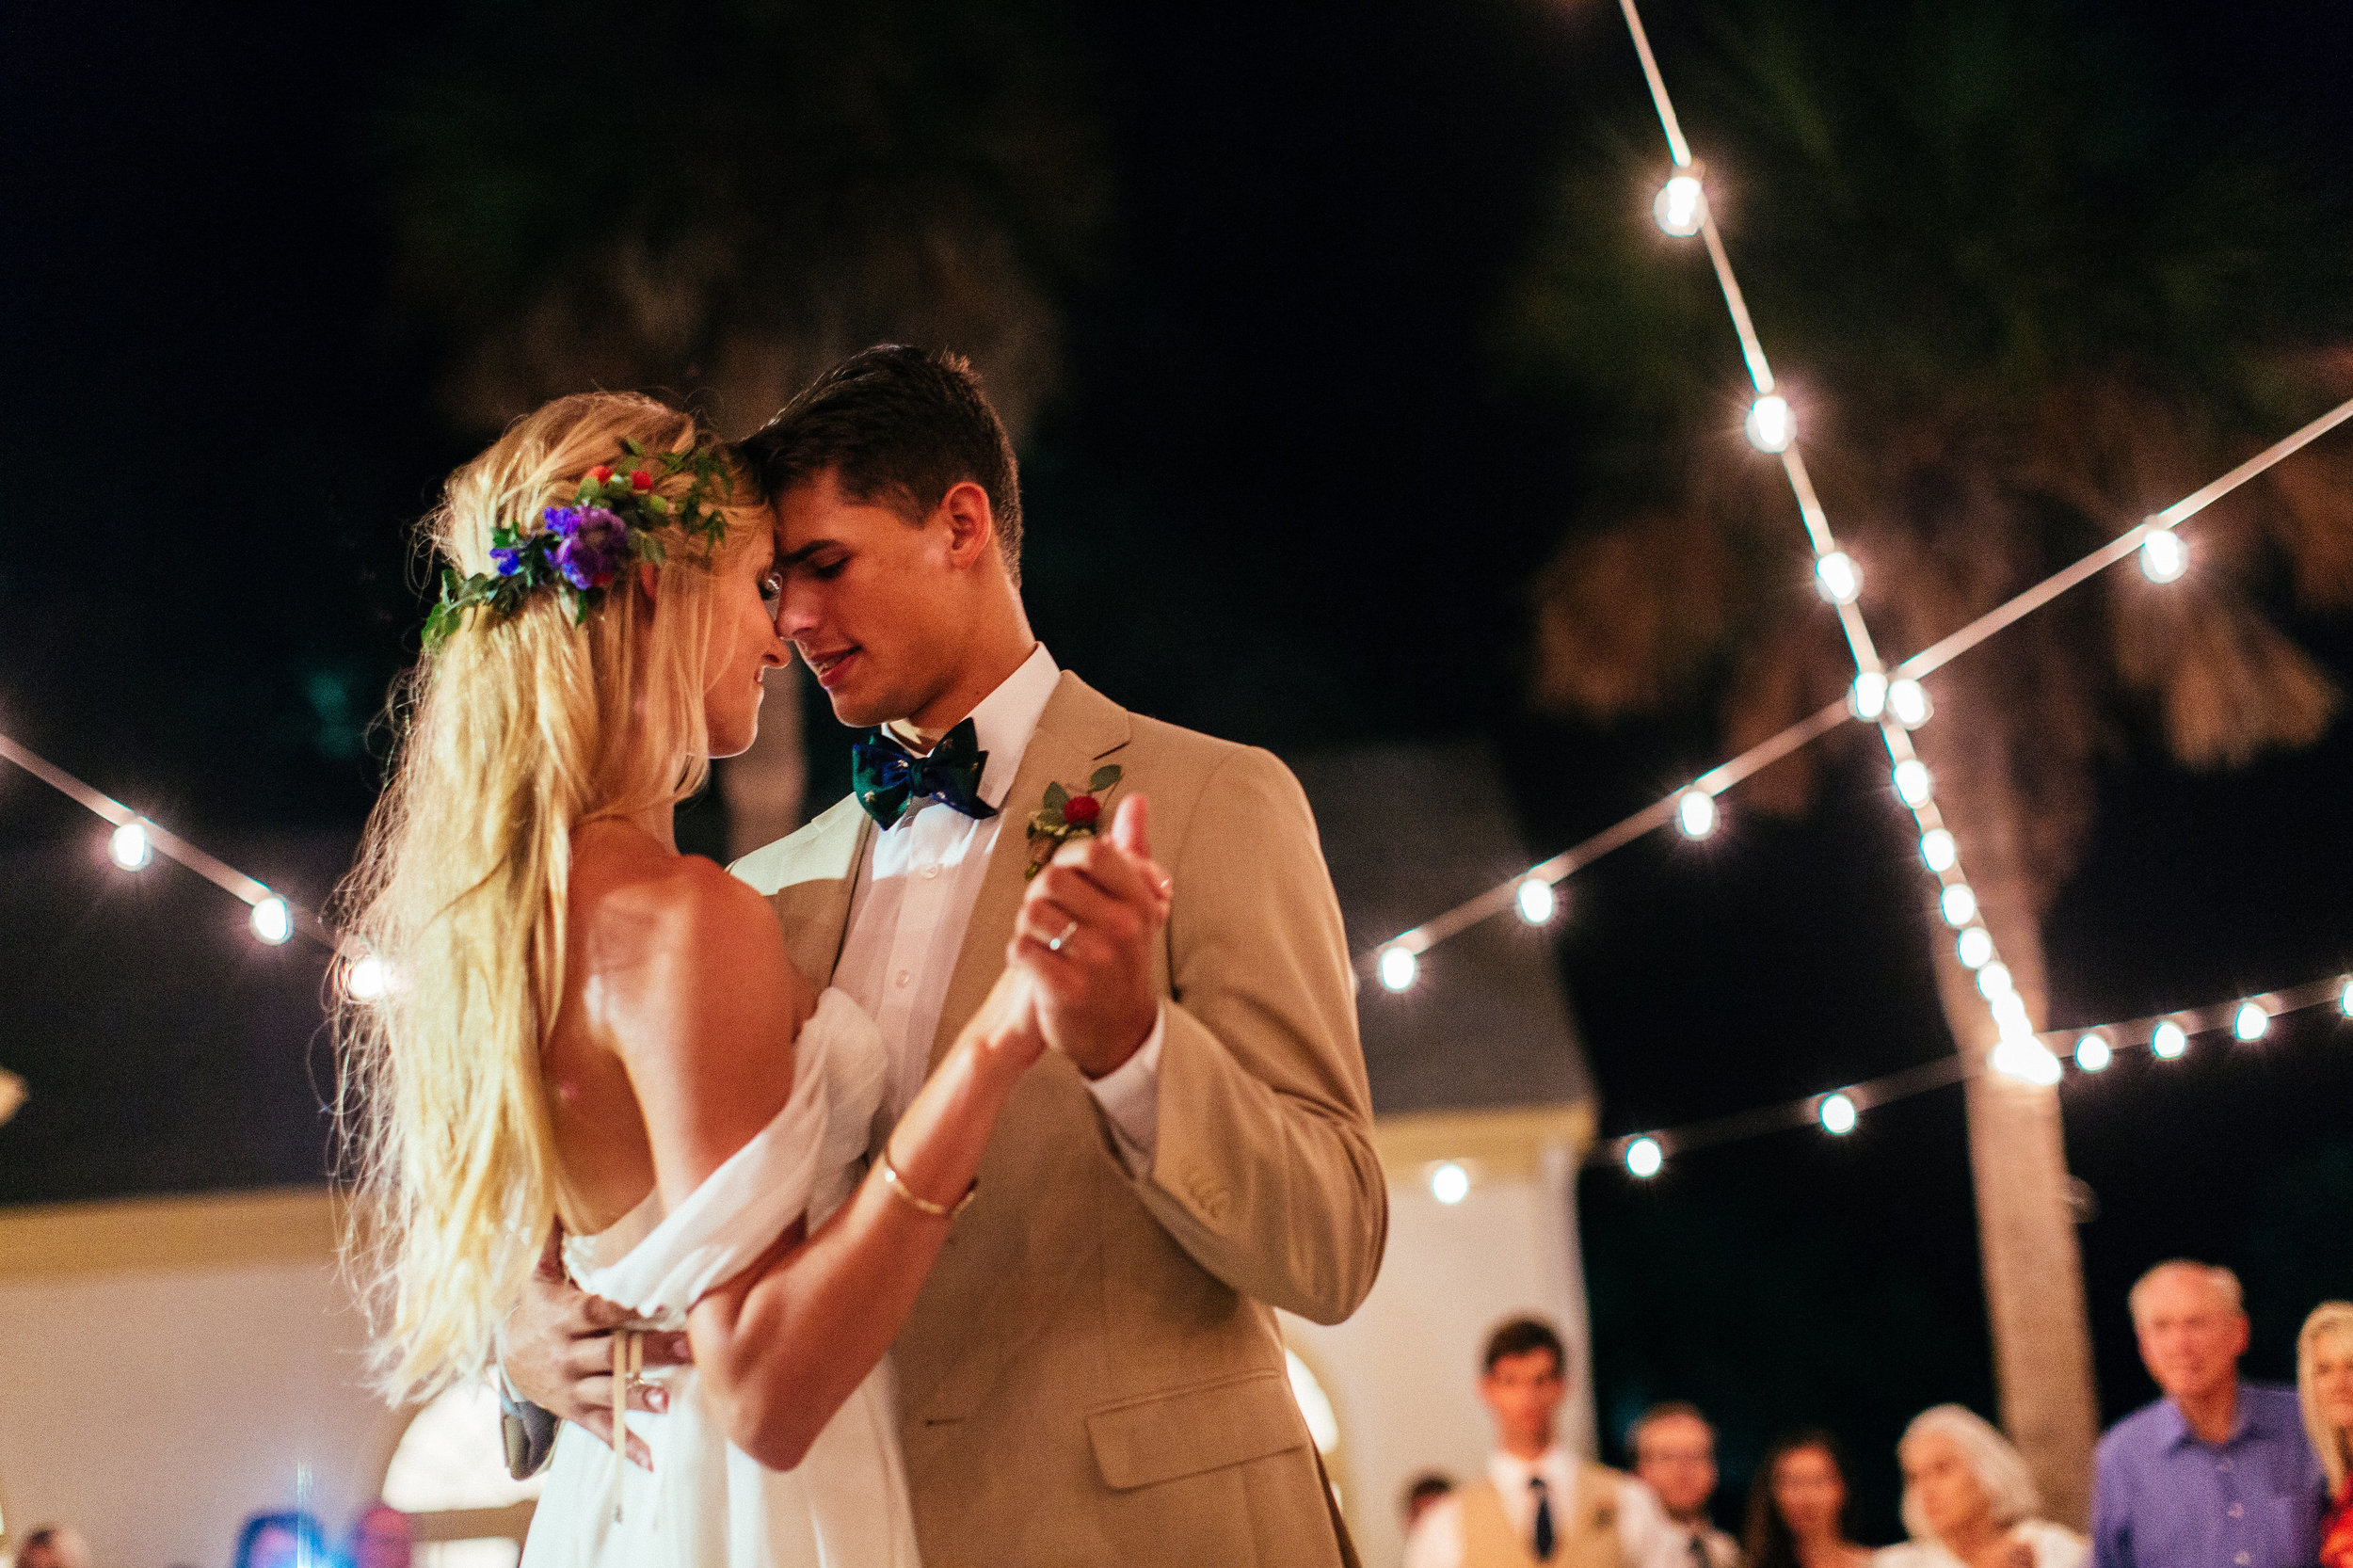 christina-karst-photography-ivory-and-beau-bridal-boutique-sarah-seven-lafayette-boho-bride-boho-bridal-boutique-indie-bridal-boutique-savannah-bridal-boutique-savannah-wedding-dresses-savannah-bridal-gowns-32.jpg